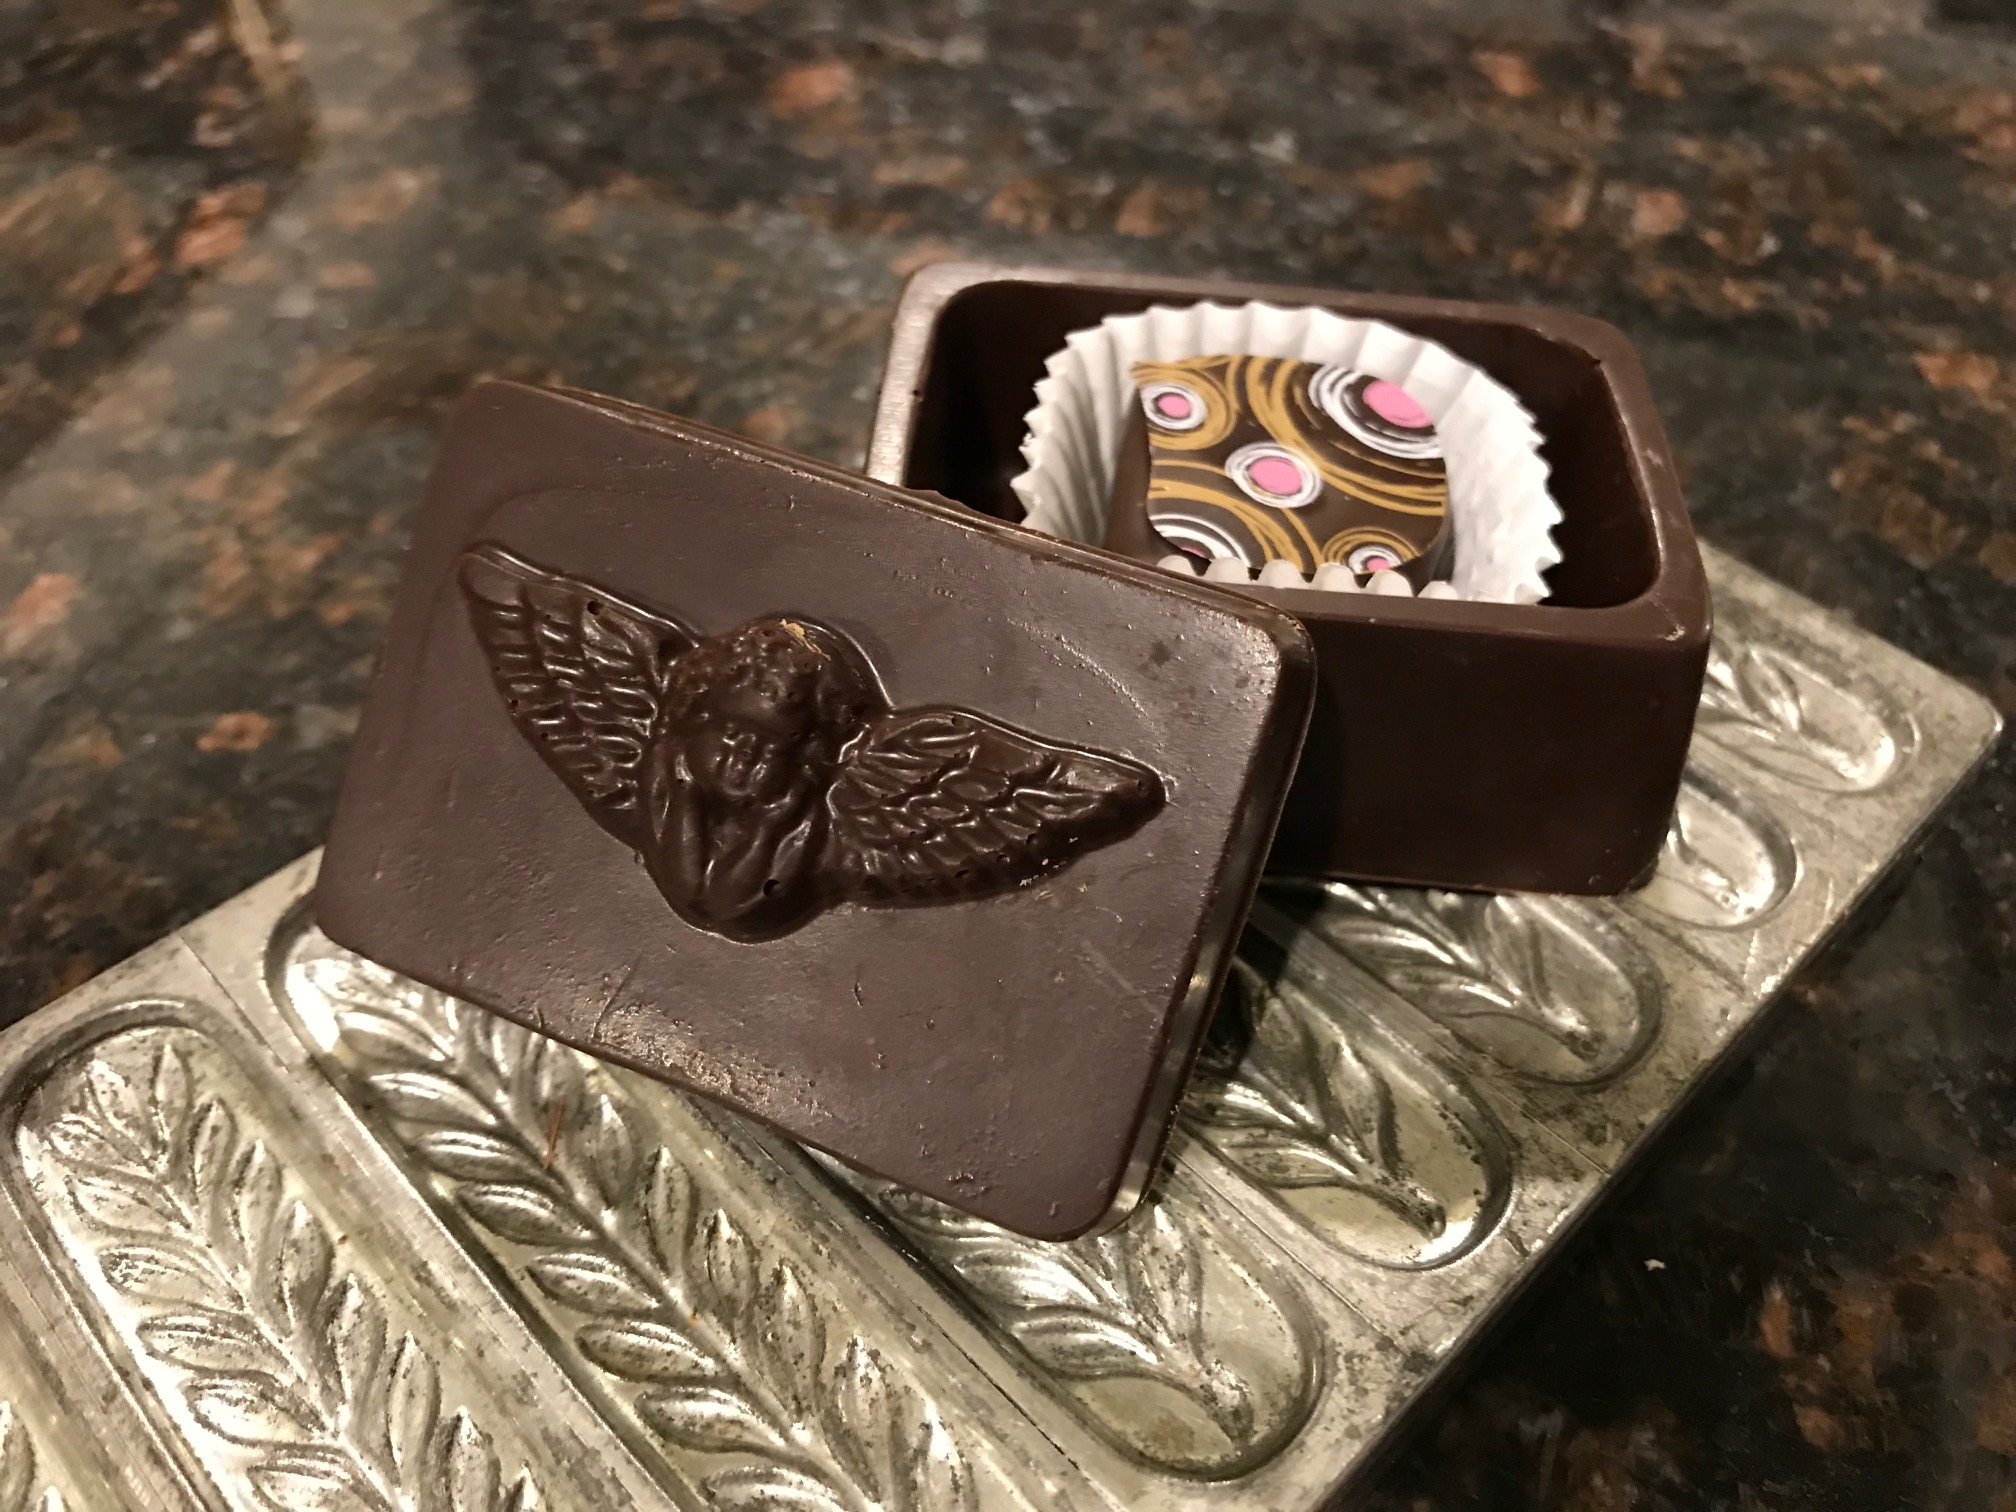 Focus: Devising true artisan confectionery artforms